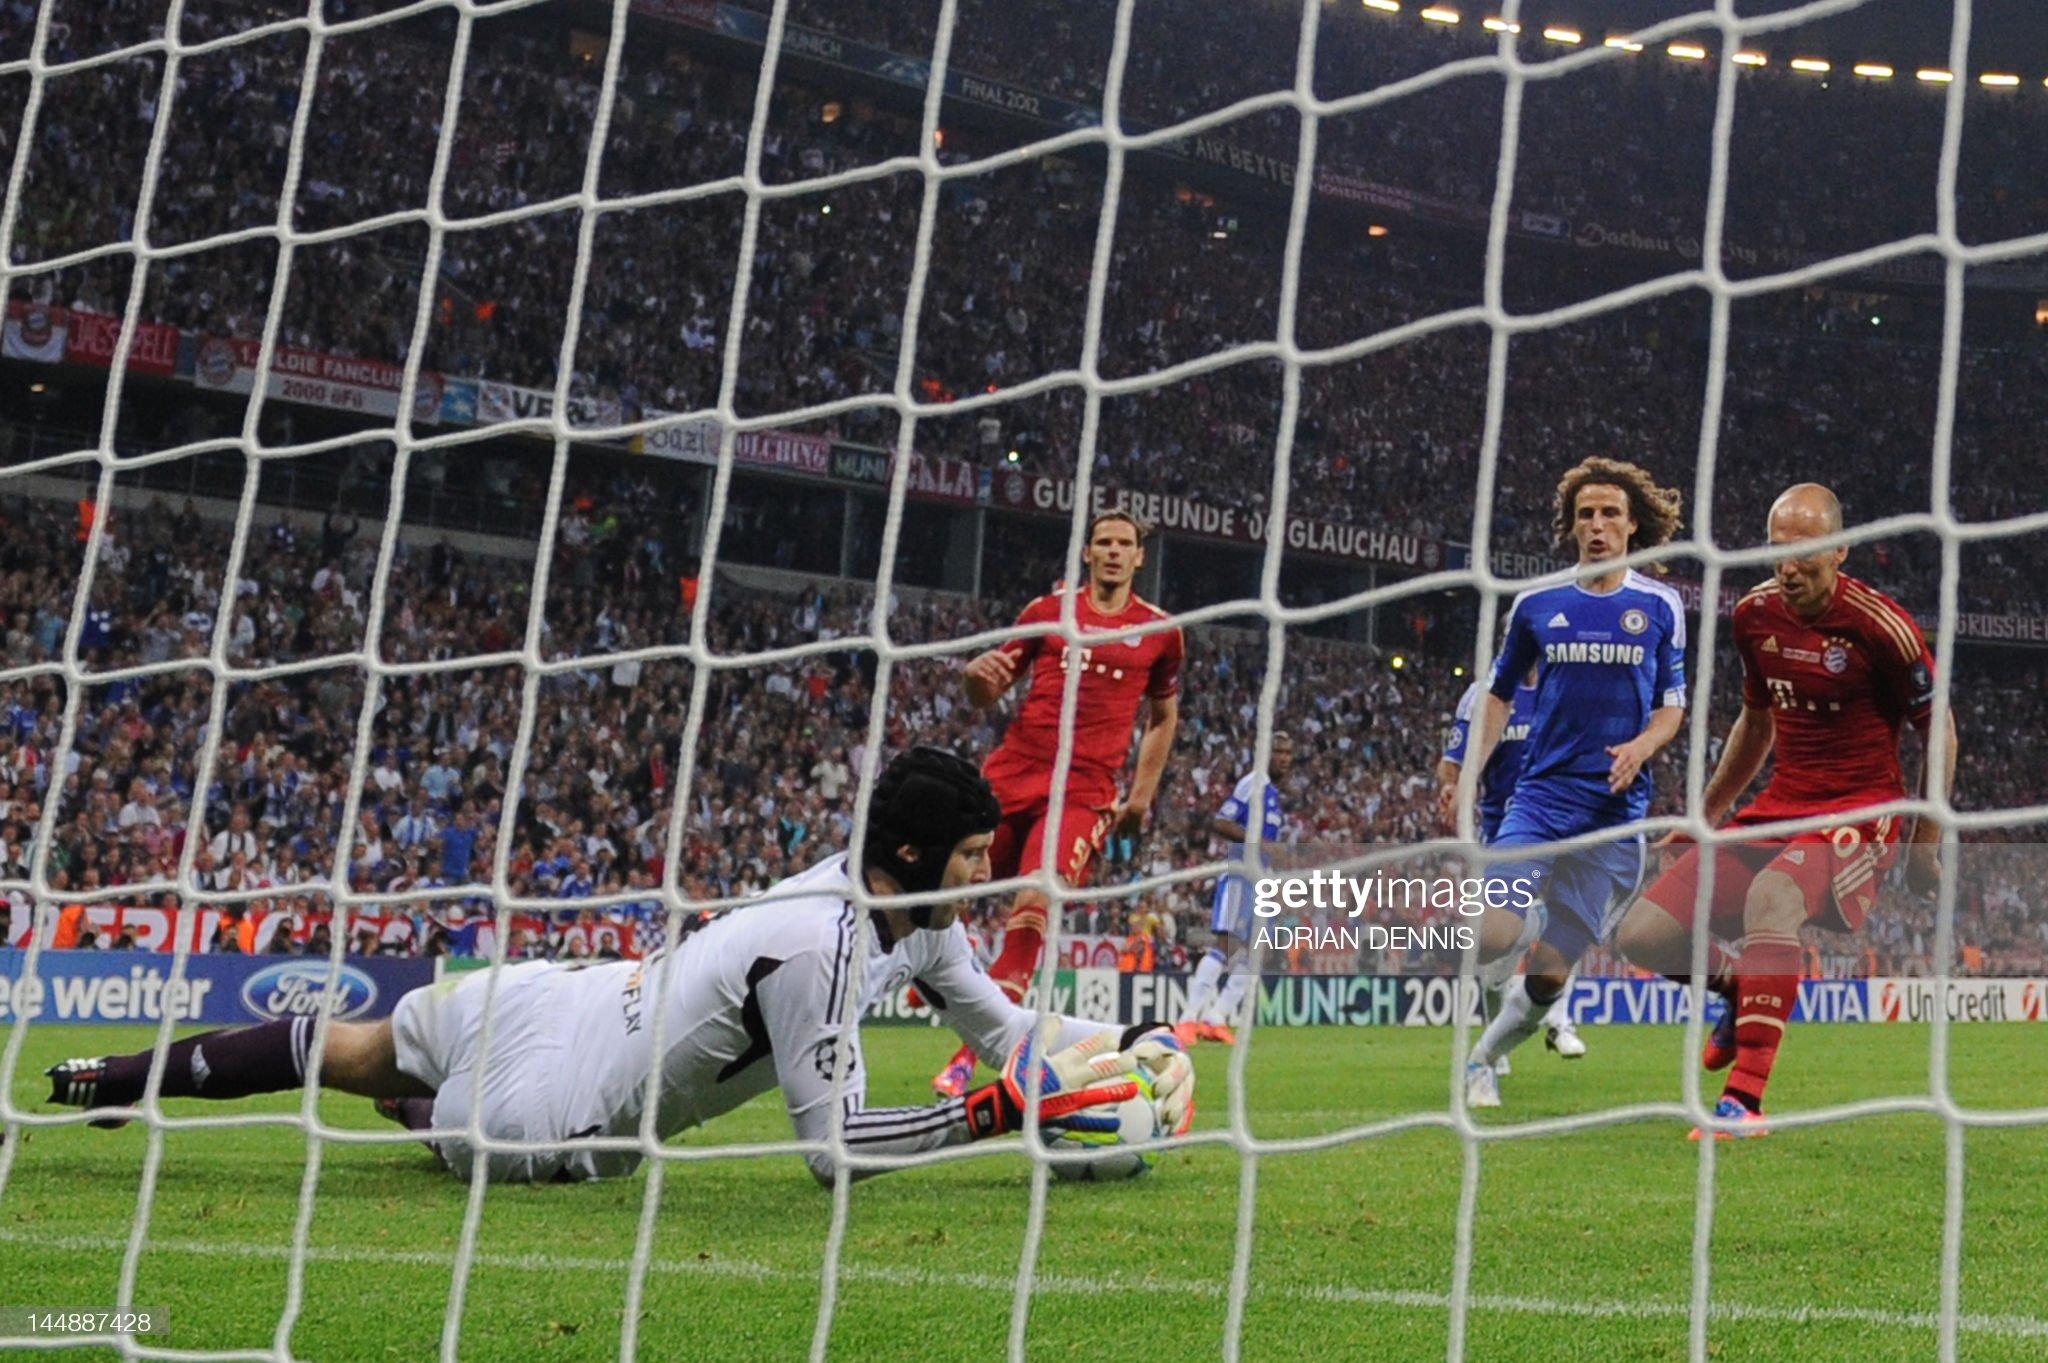 Chelsea's Czech goalkeeper Petr Cech (L) : Fotografia de notícias